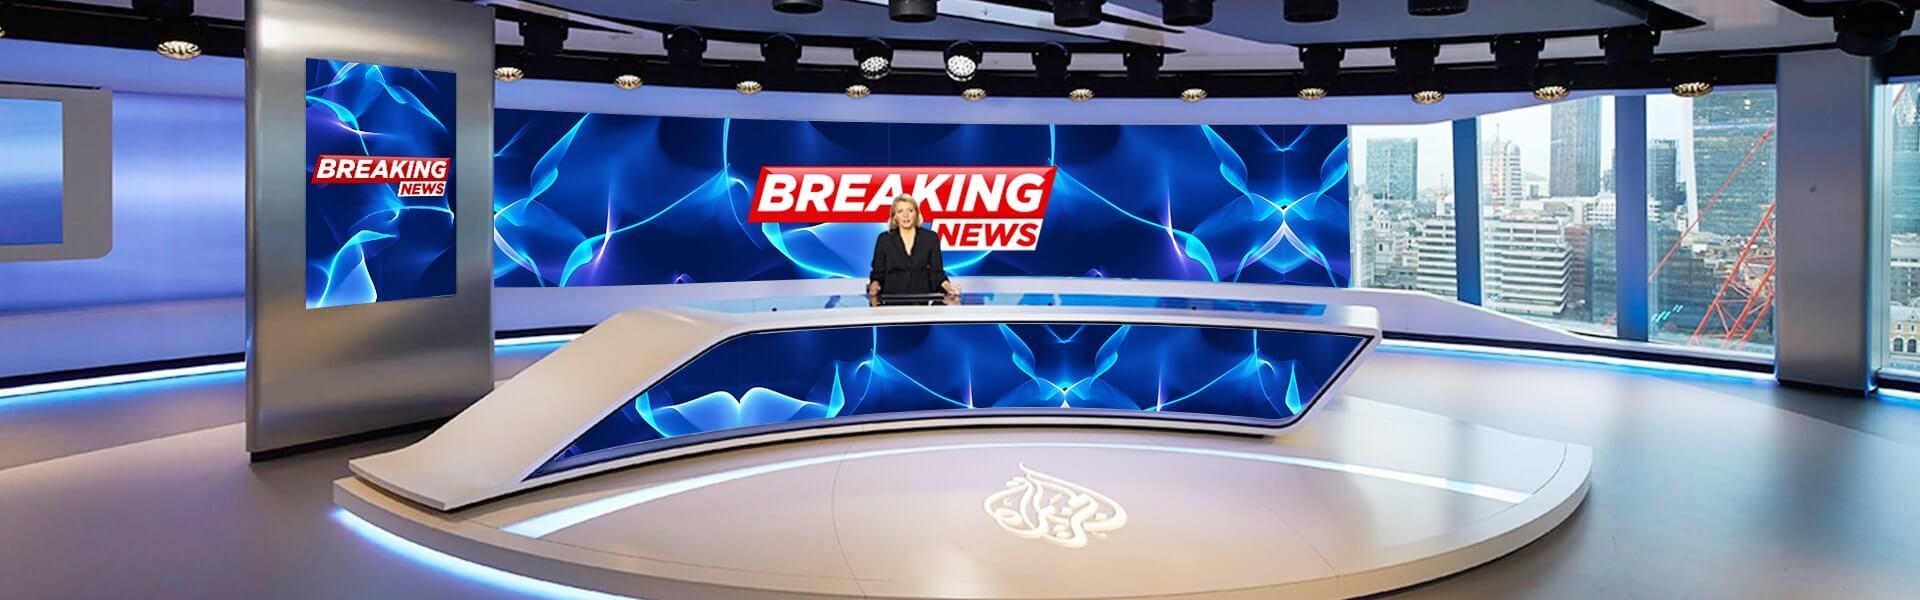 Broadcast- breaking news